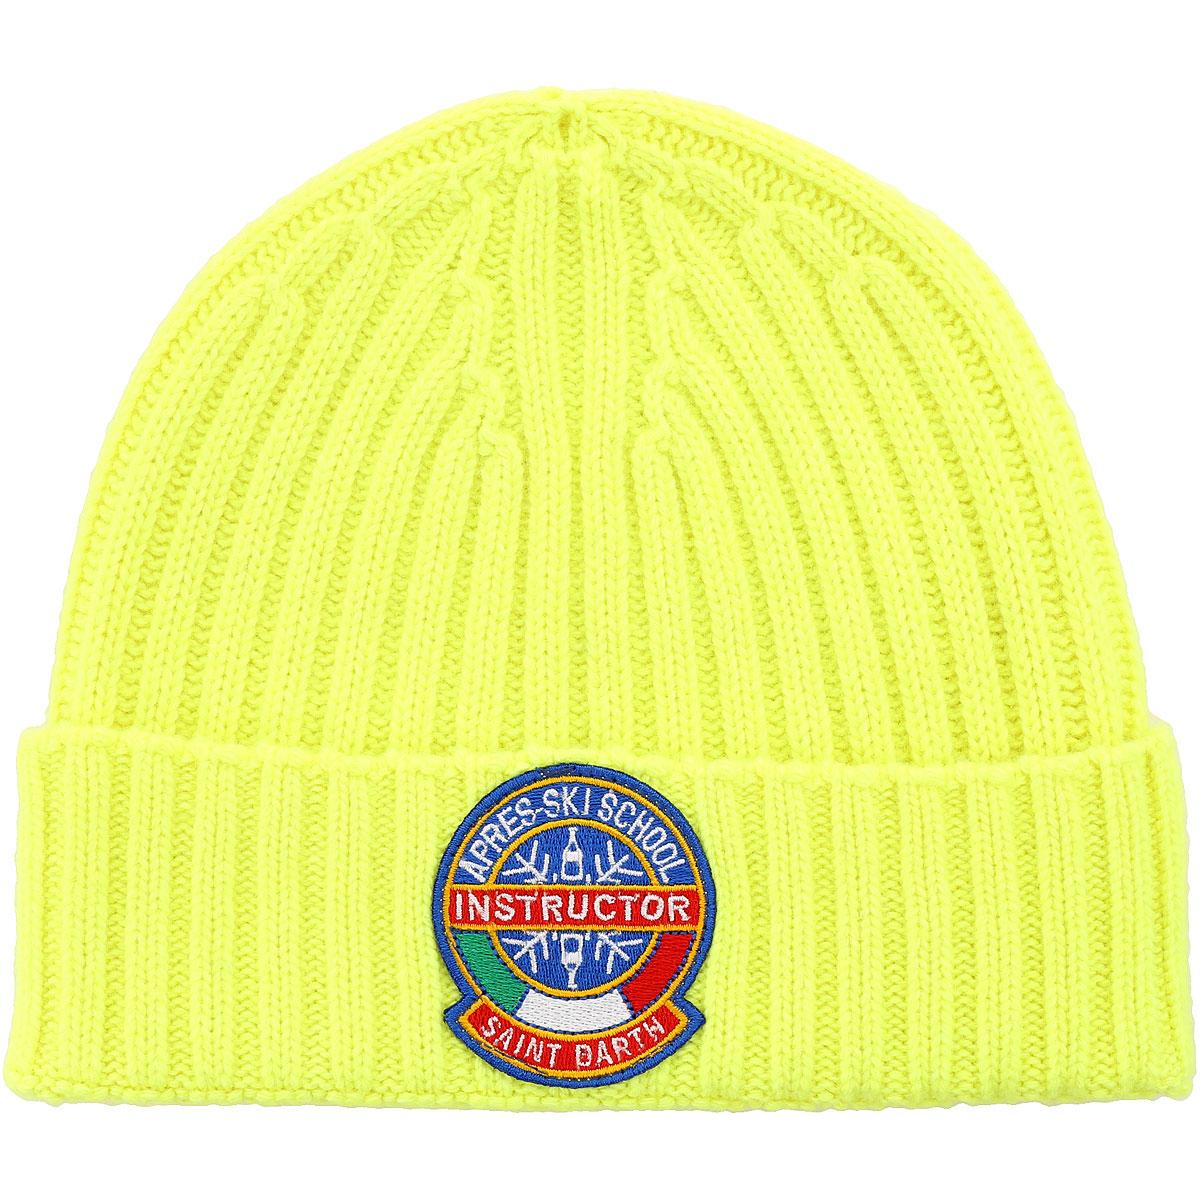 Mc2 Saint Barth Hat for Women, fluo yellow, Wool, 2019